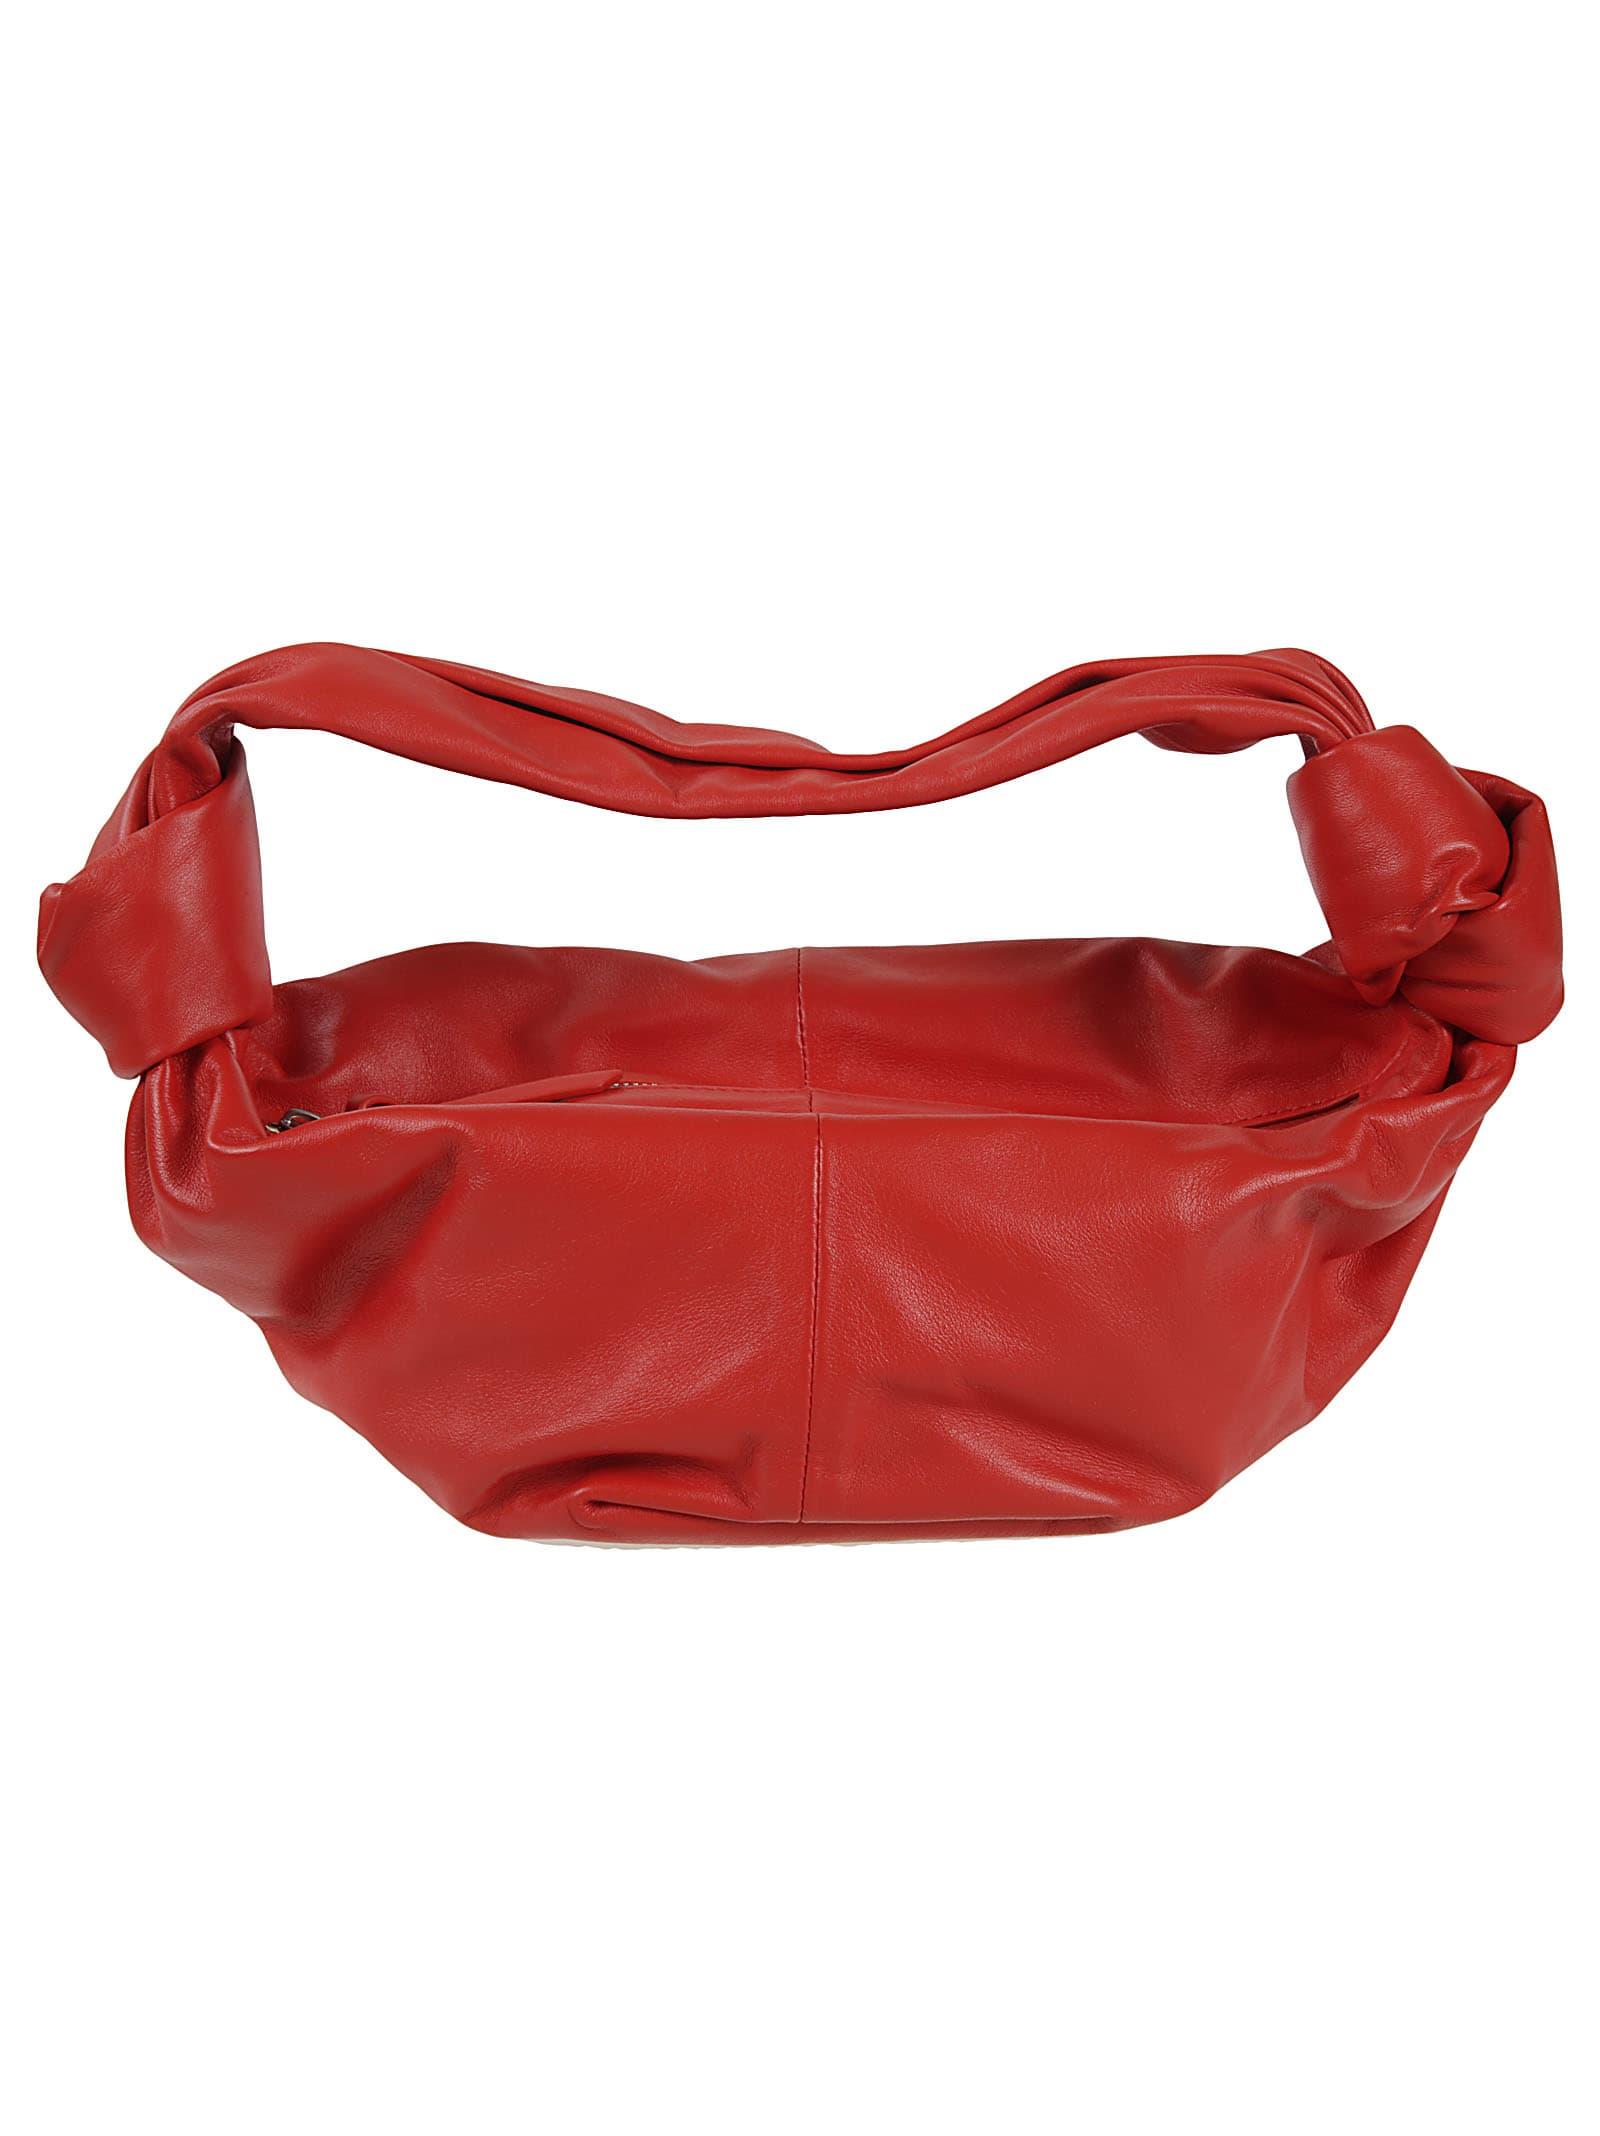 Bottega Veneta Jodie Leather Mini Bag